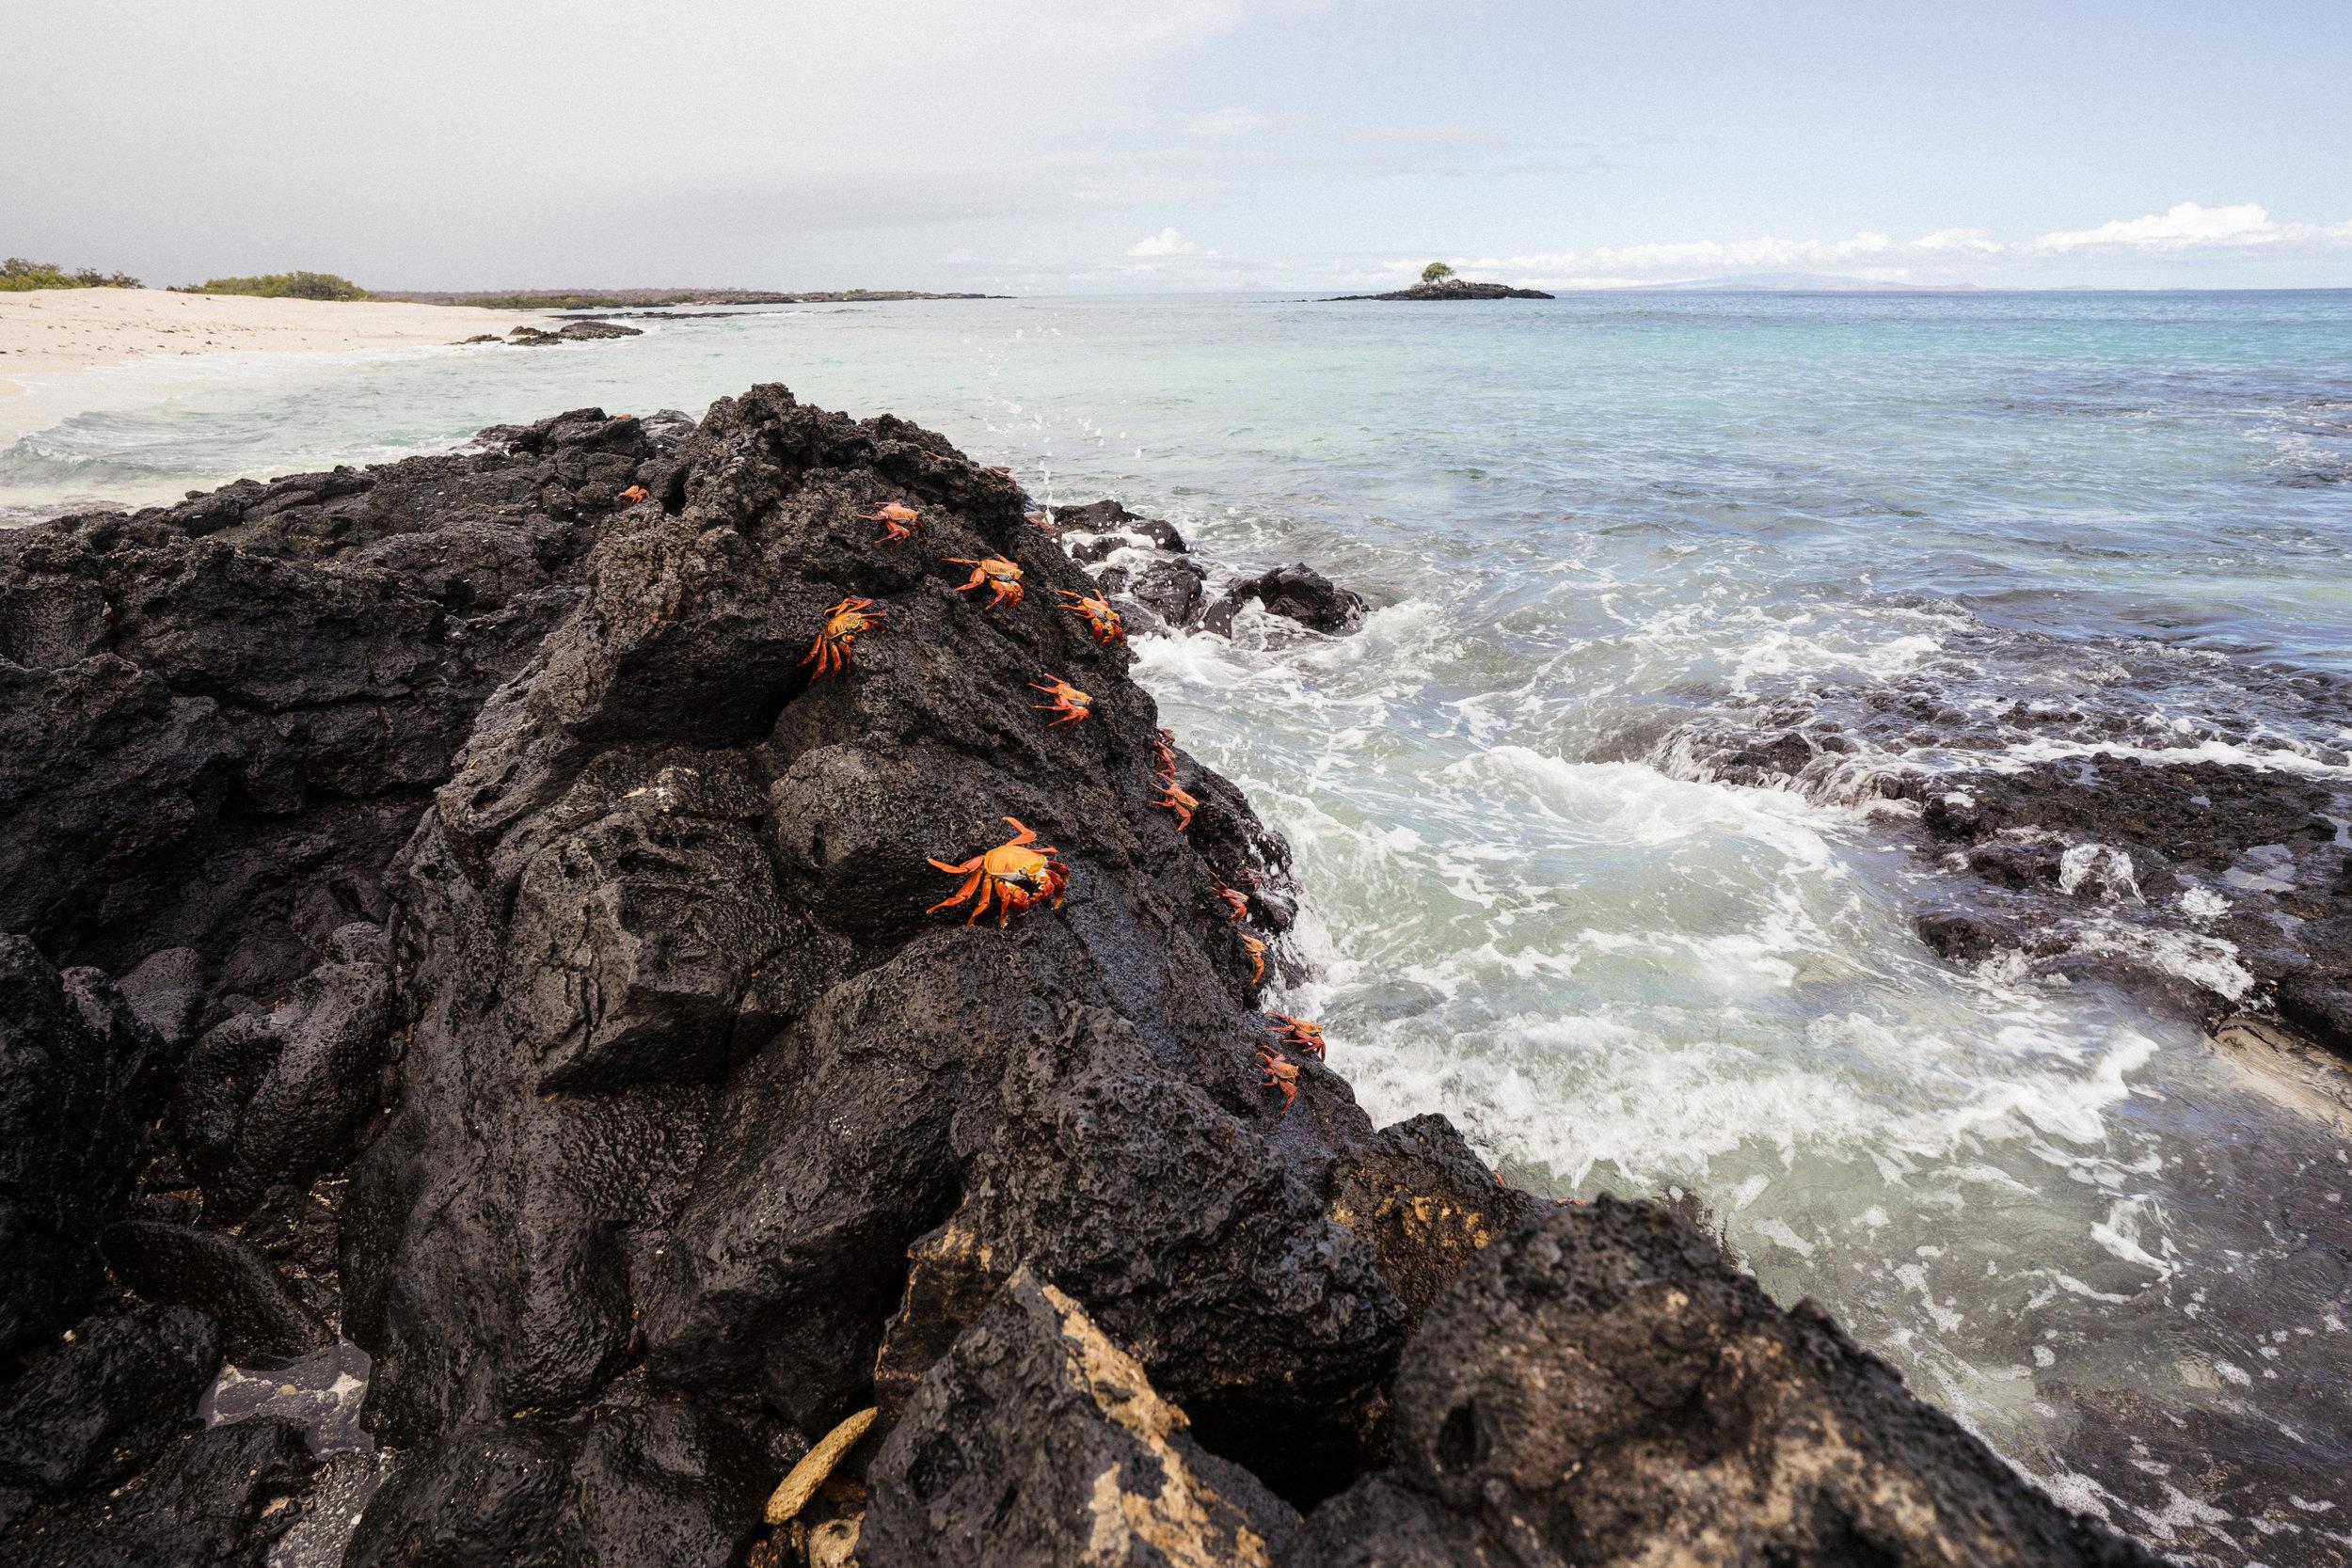 Sally Lightfoot crabs at Las Bachas Beach on the north side of Santa Cruz Island, Galápagos